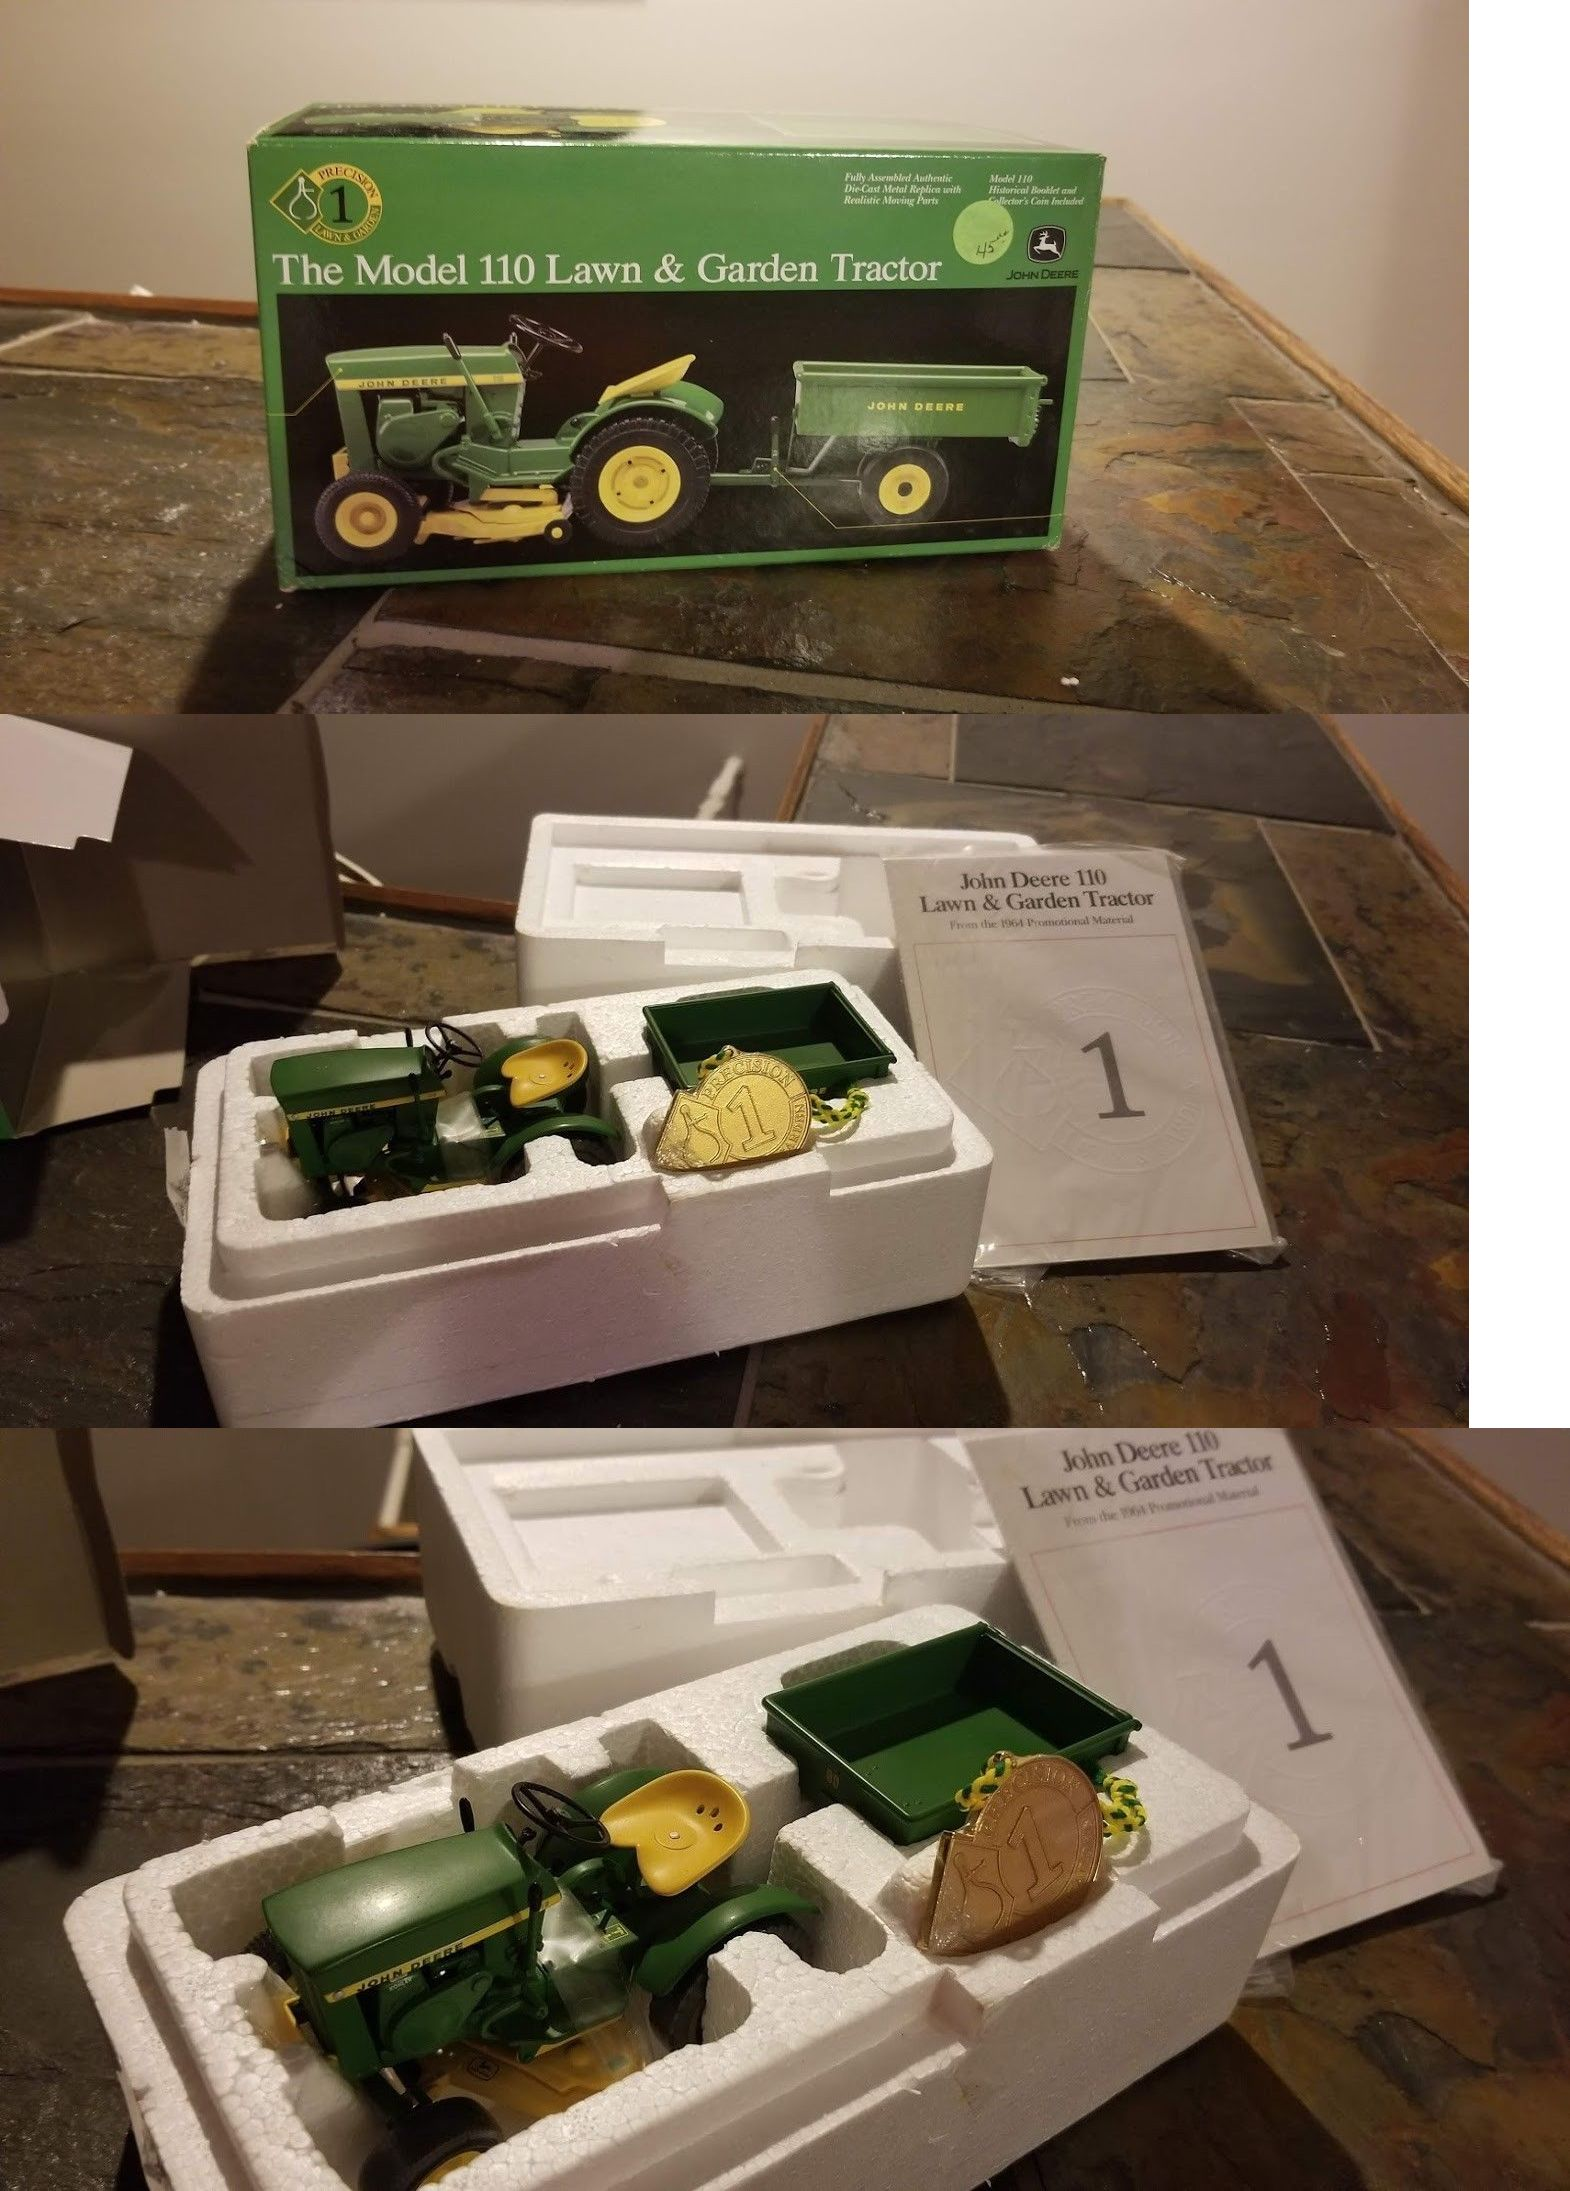 John deere 110 lawn and garden tractor precision #1 | Farm Vehicles ...